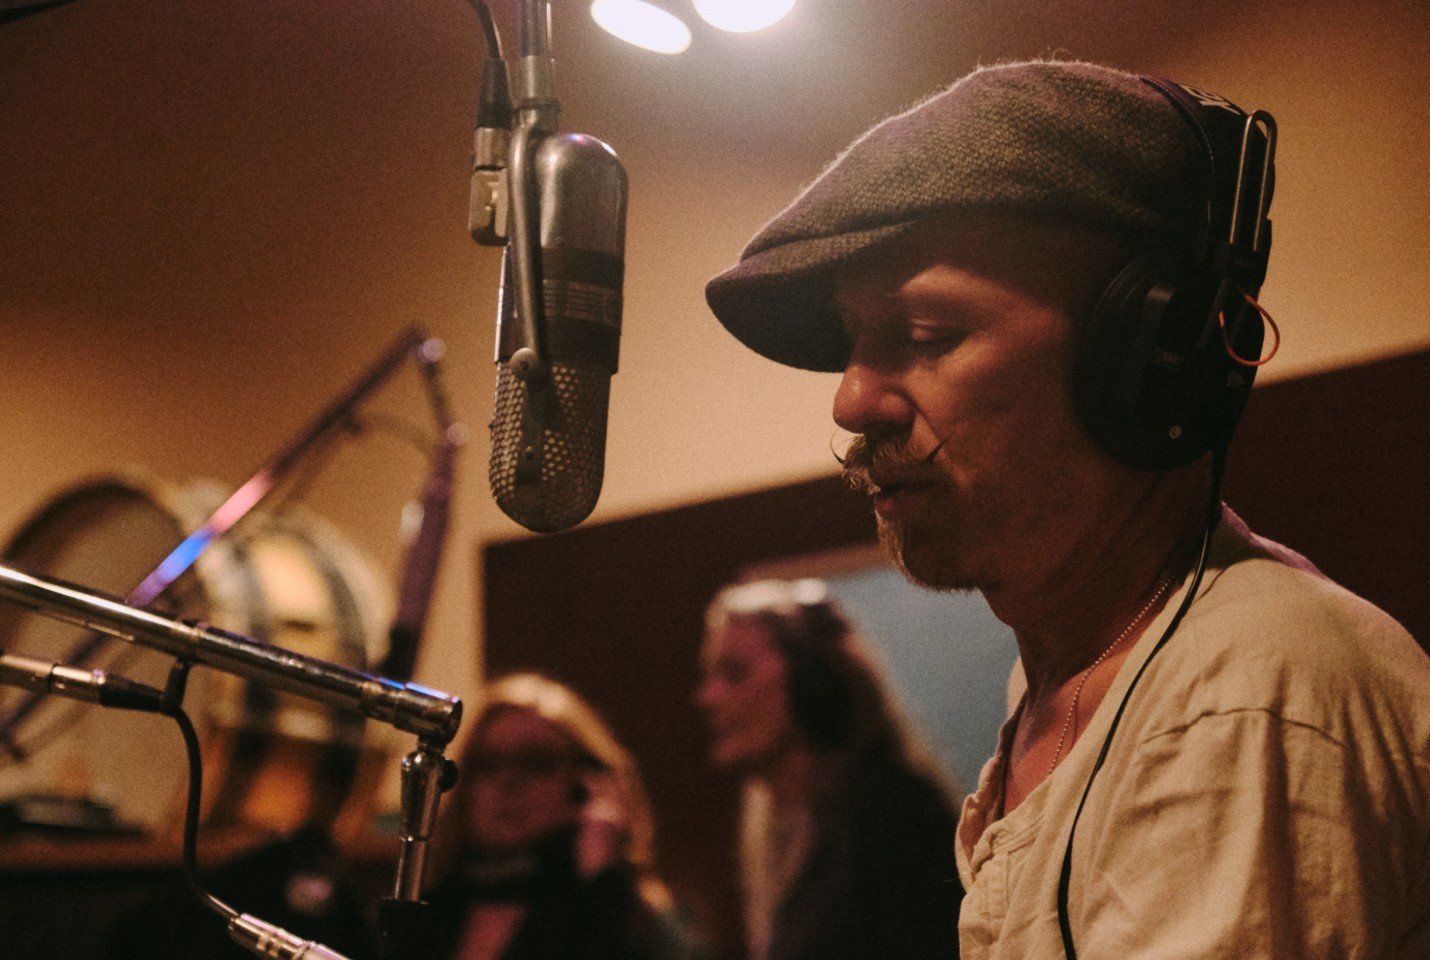 Foy Vance Announces Second Album Release of 2019